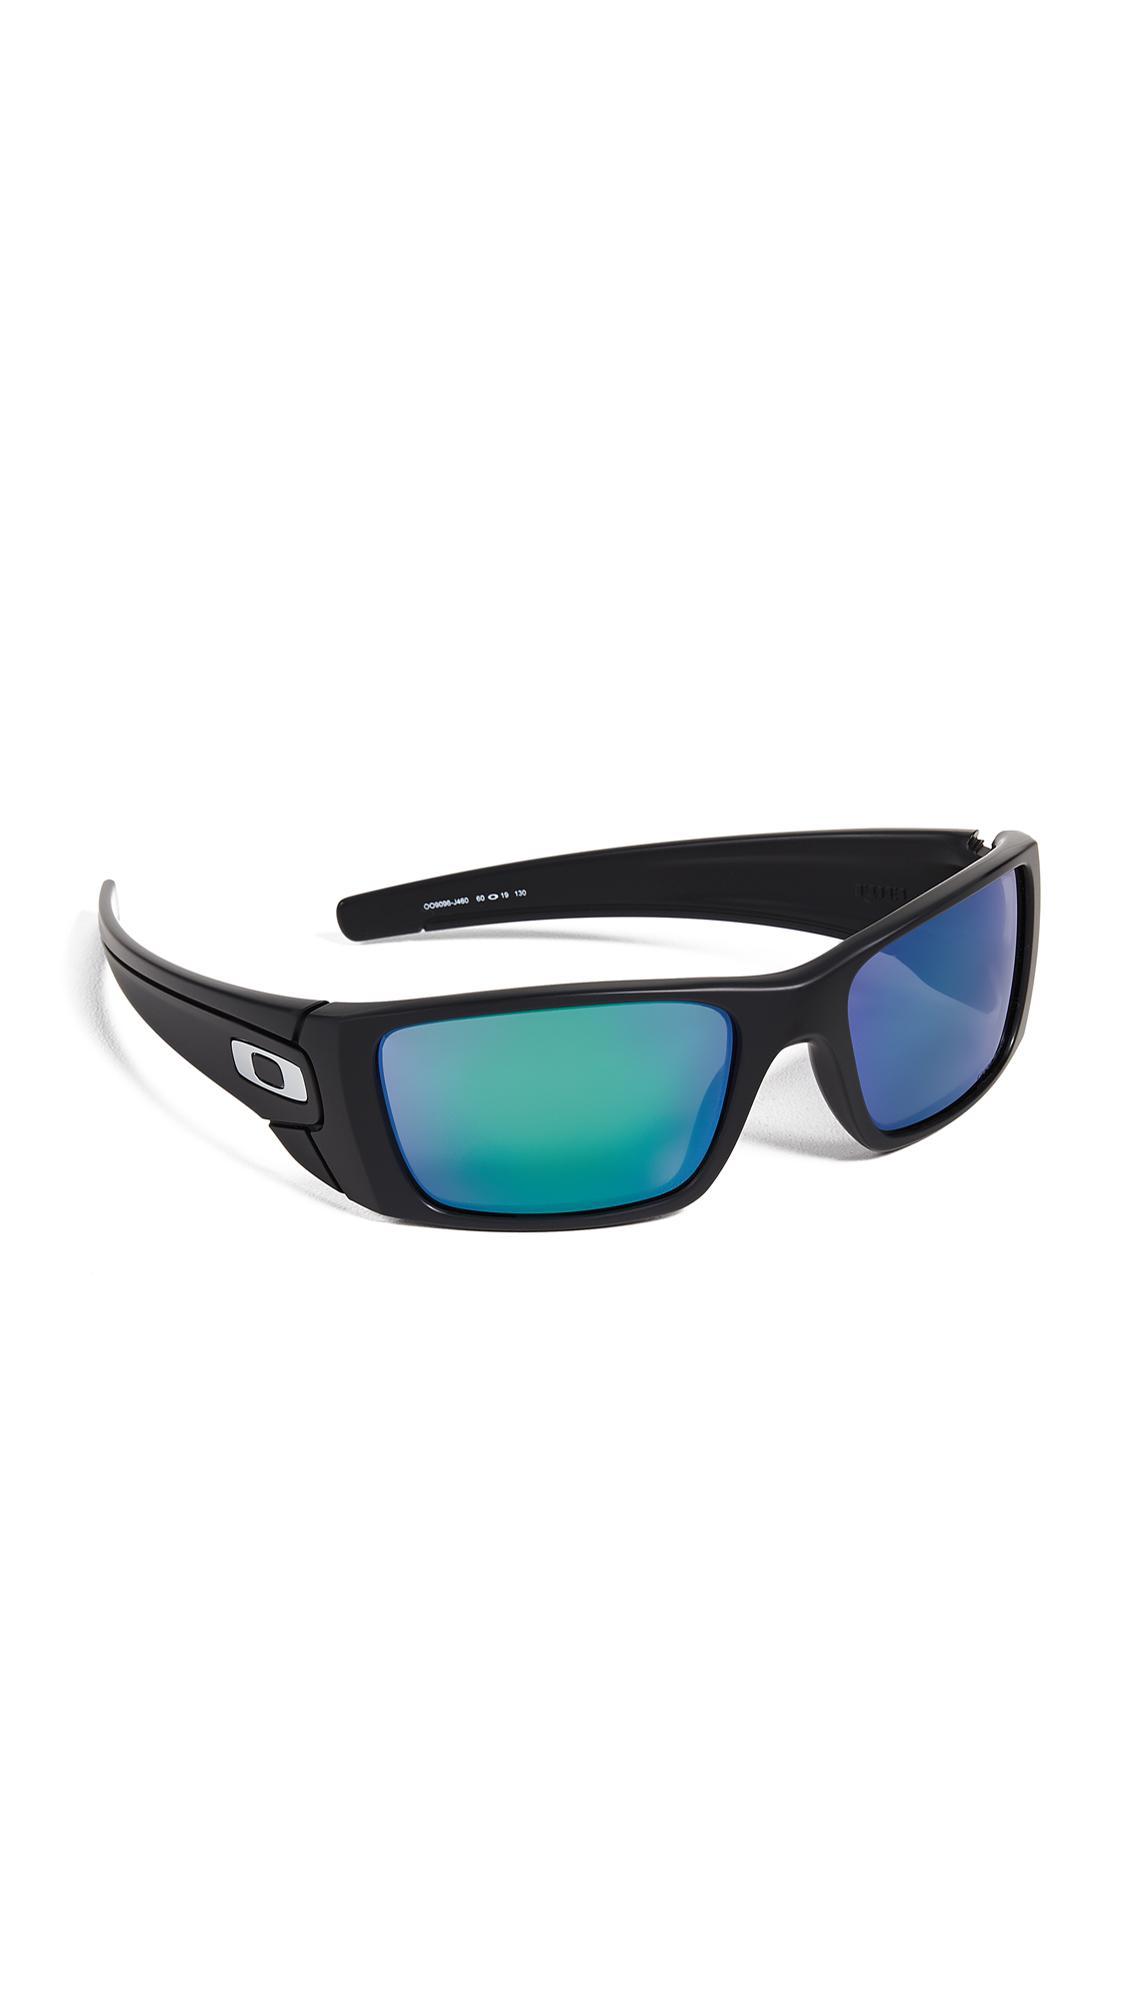 213101d193 Oakley Fuel Cell Sunglasses in Black for Men - Lyst